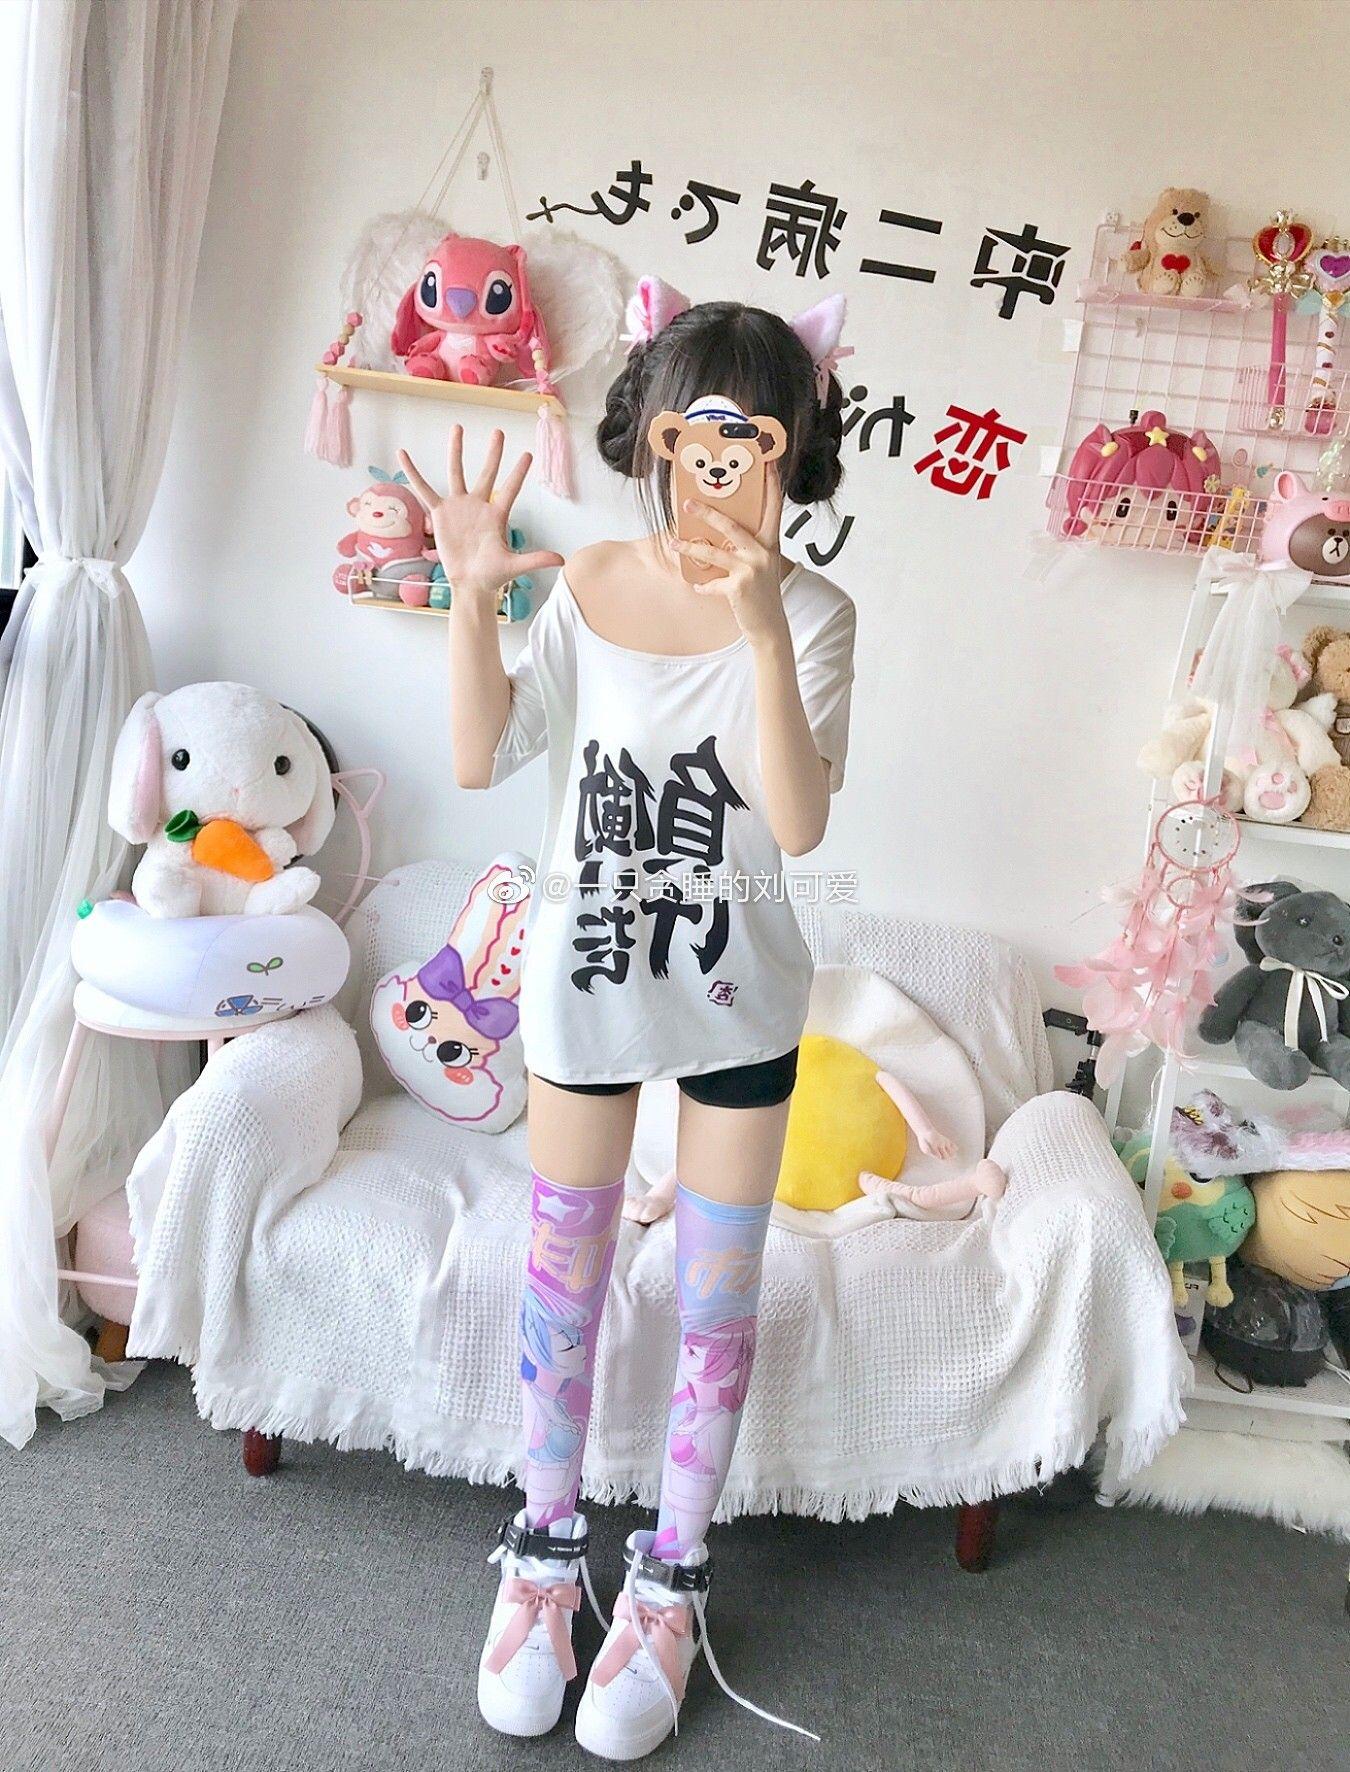 Pin by Mio on ᶜˡᵒᵗʰᵉˢ 服 ᵔᴥᵔ  Cute japanese girl, Kawaii